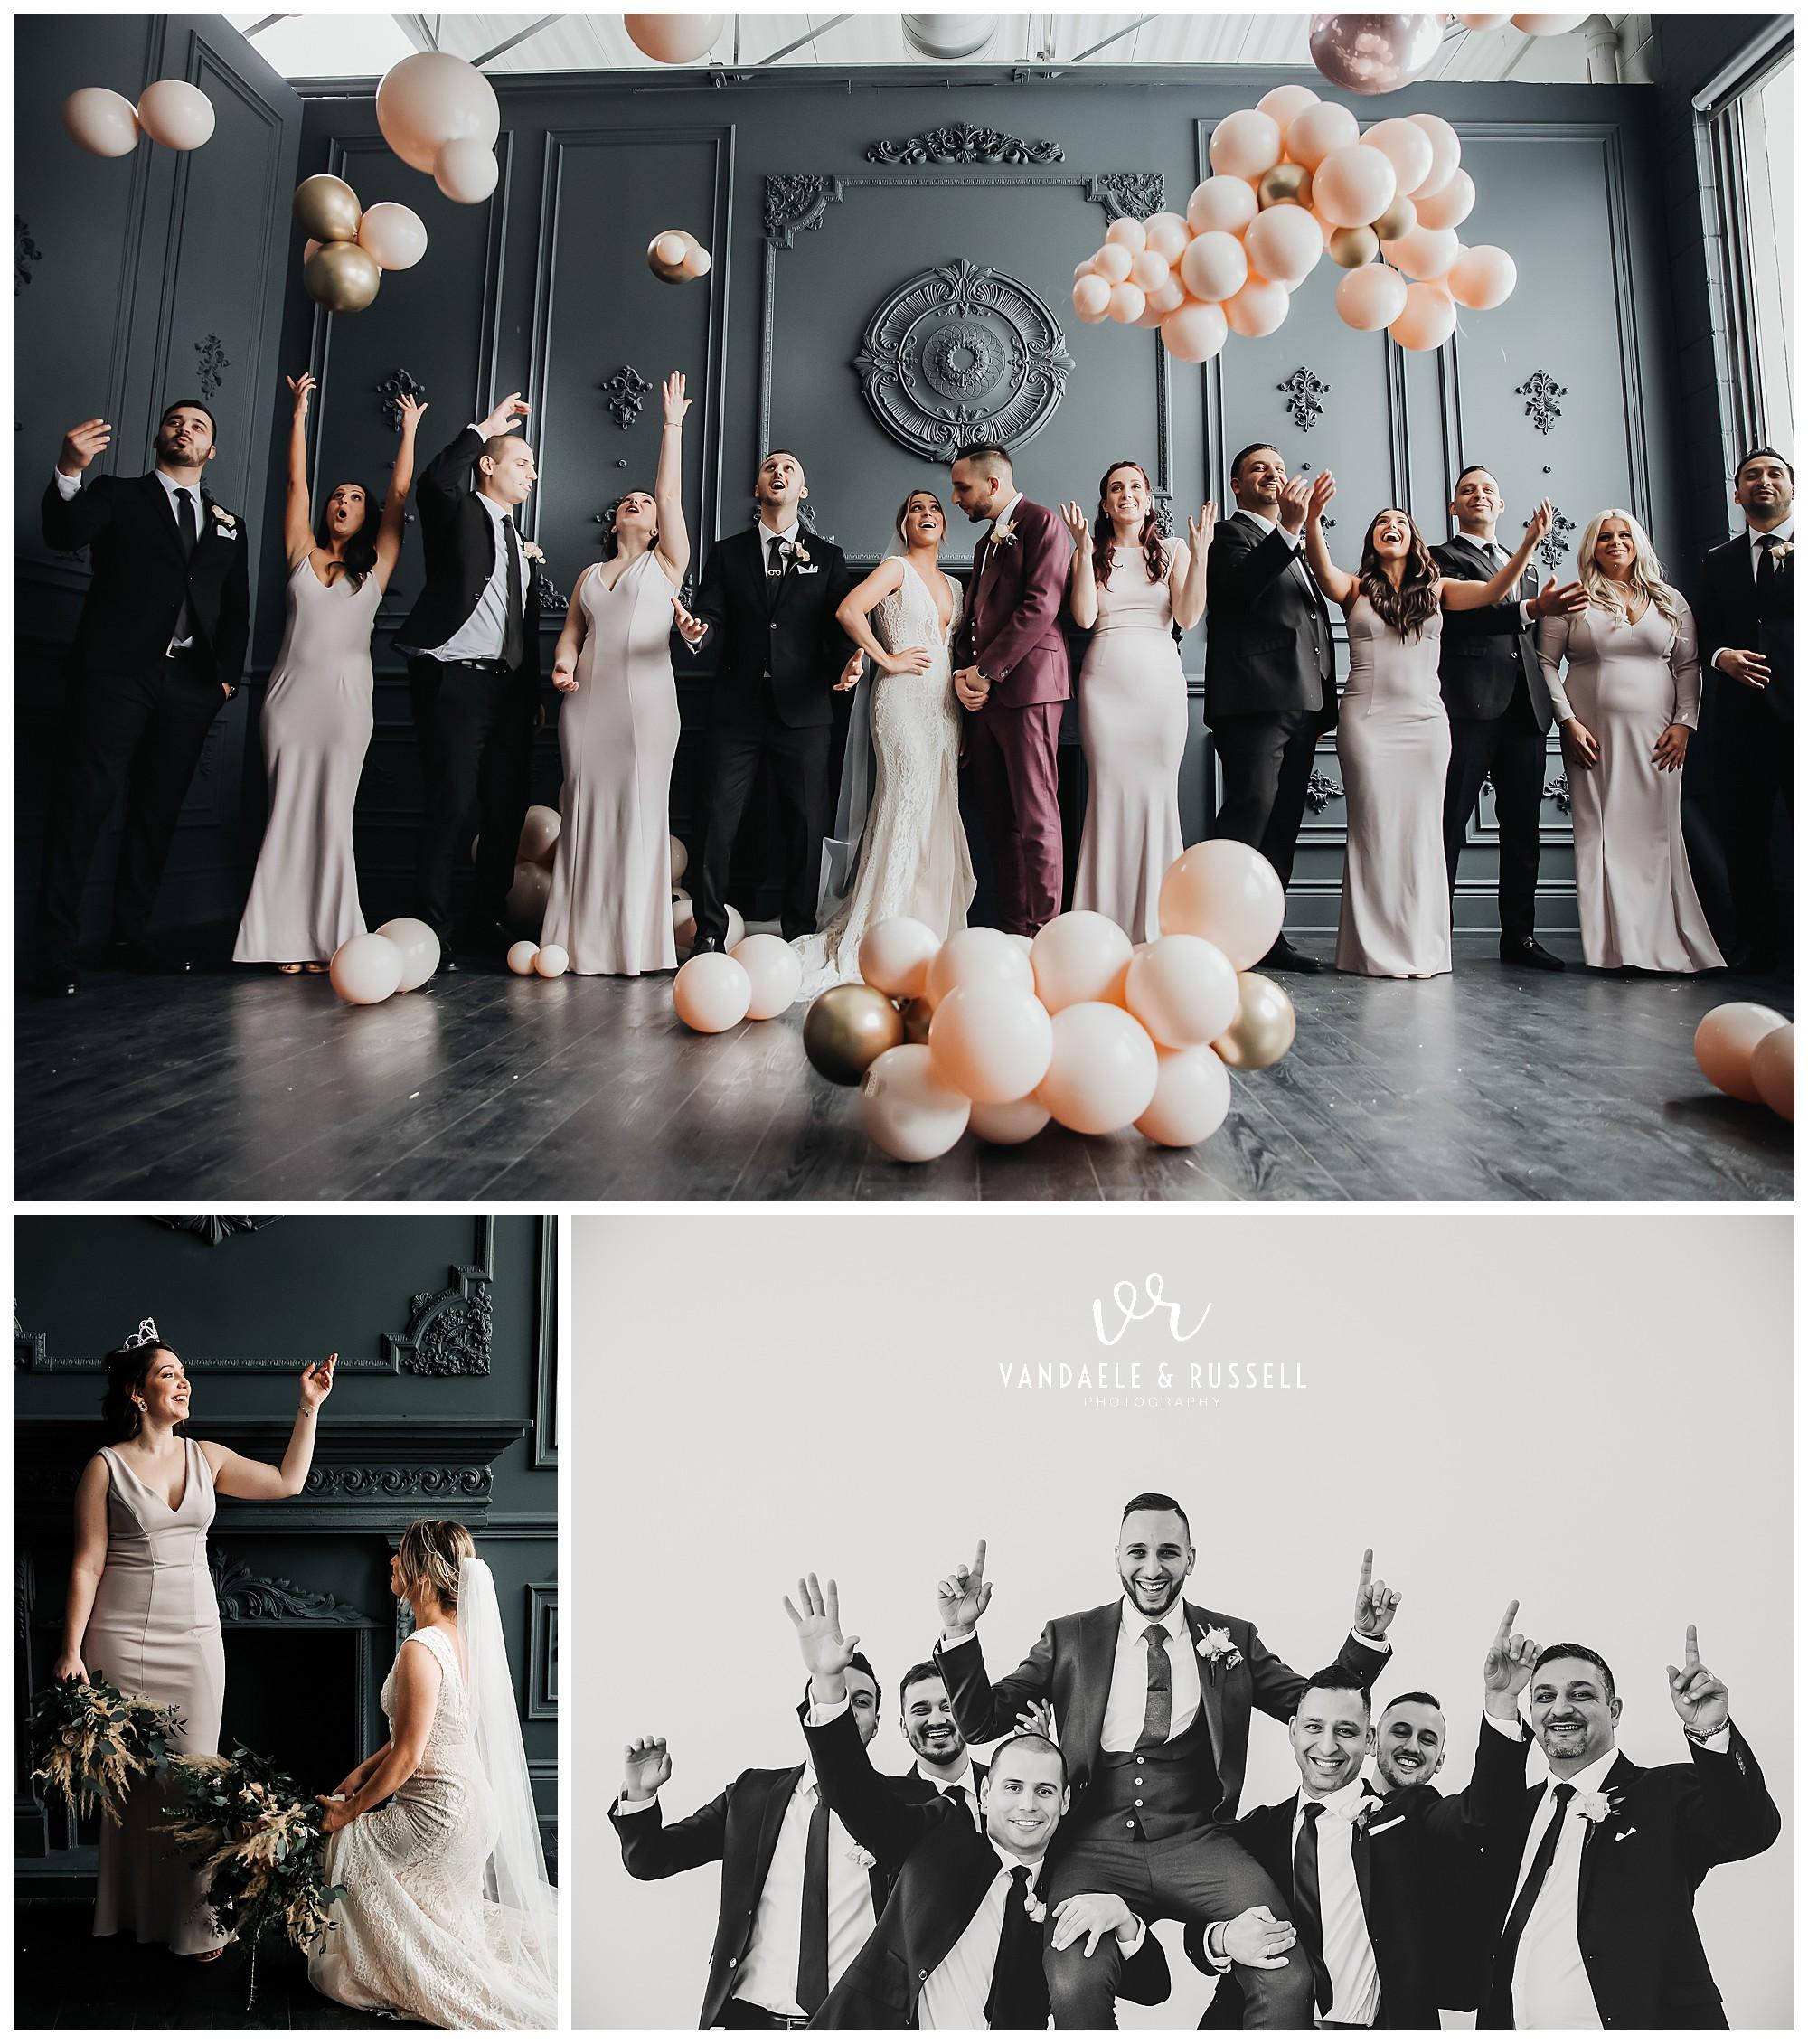 Joanna-Christos-Grand-Luxe-Wedding-Photos-Mint-Room-Toronto-VanDaele-Russell_0081.jpg